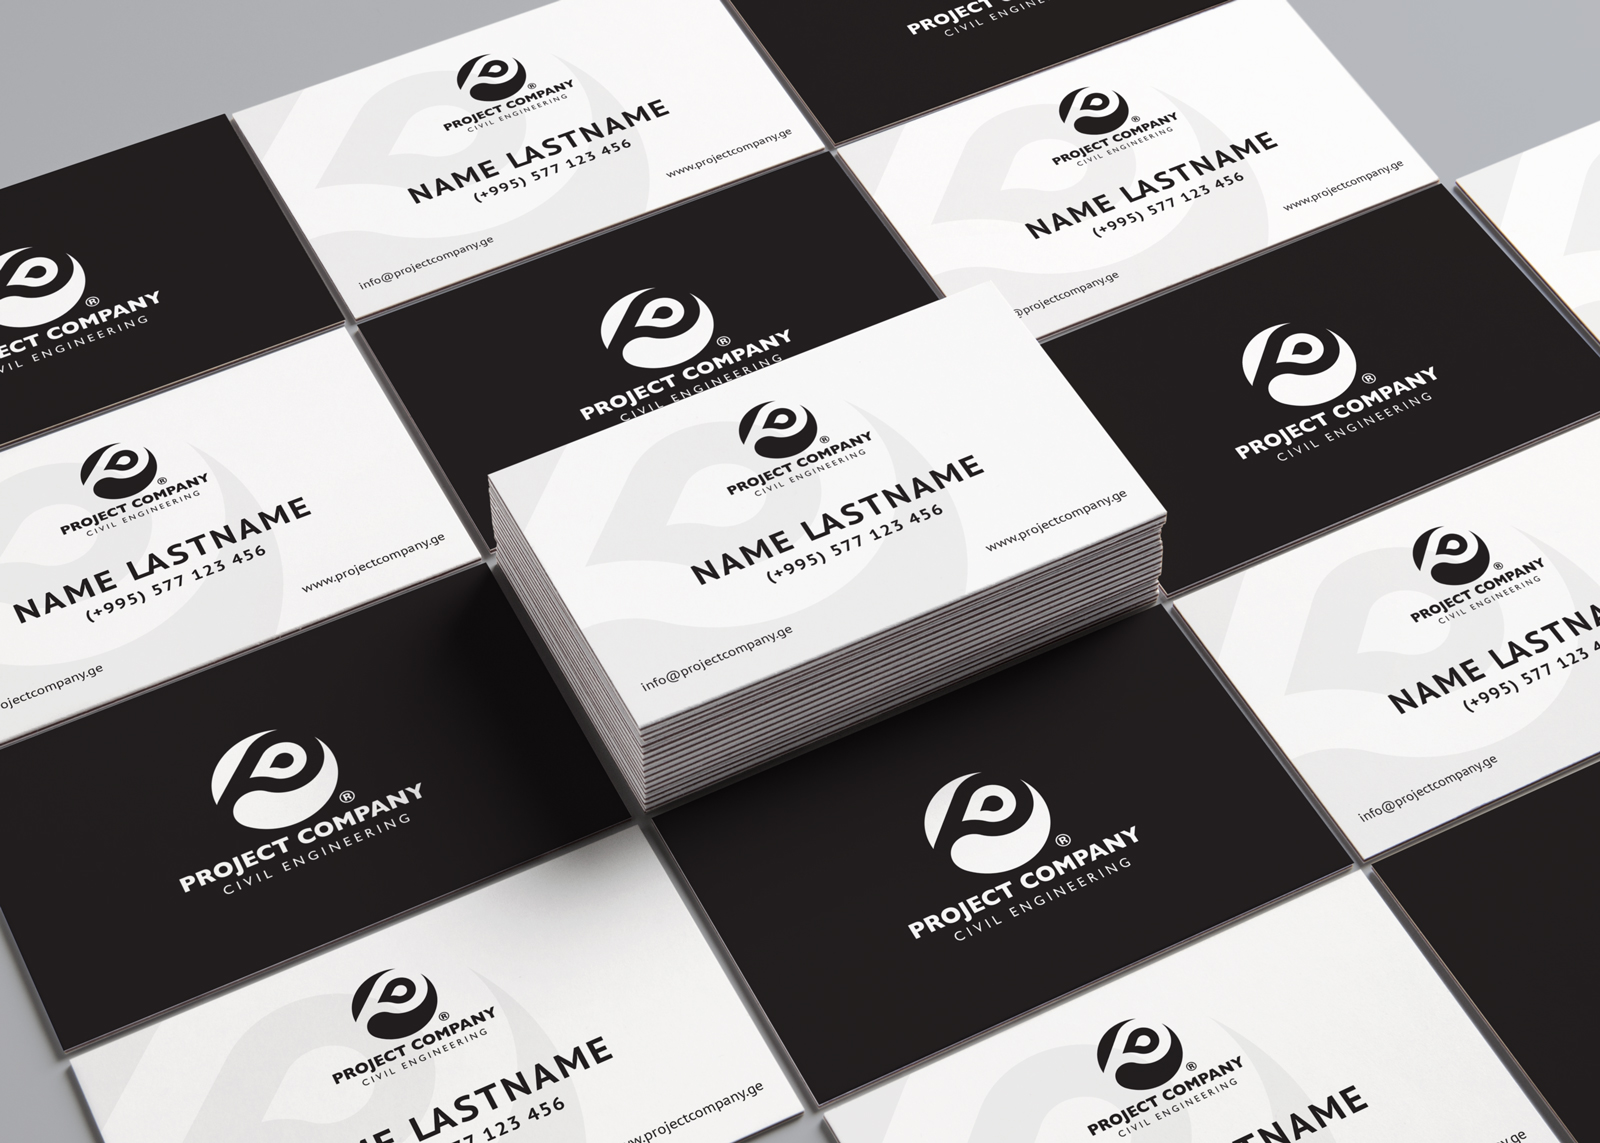 Project company business card design, ლოგოს დამზადება, ლოგოს დიზაინი, ლოგოების შექმნა, ლოგოების დამზადება, ლოგოს დამზადების ფასი,  ბრენდინგი, ბანერების დამზადება, ლოგოტიპის შექმნა, ლოგოტიპების დიზაინი, ოპტიმიზაცია, facebook დიზაინი, ვებგვერდის დიზაინი, ლოგოების დიზაინი, ლოგოტიპების დამზადება, saitebis damzadena, logoebis damzadena, saitis damzadeba, logos damzadeba,